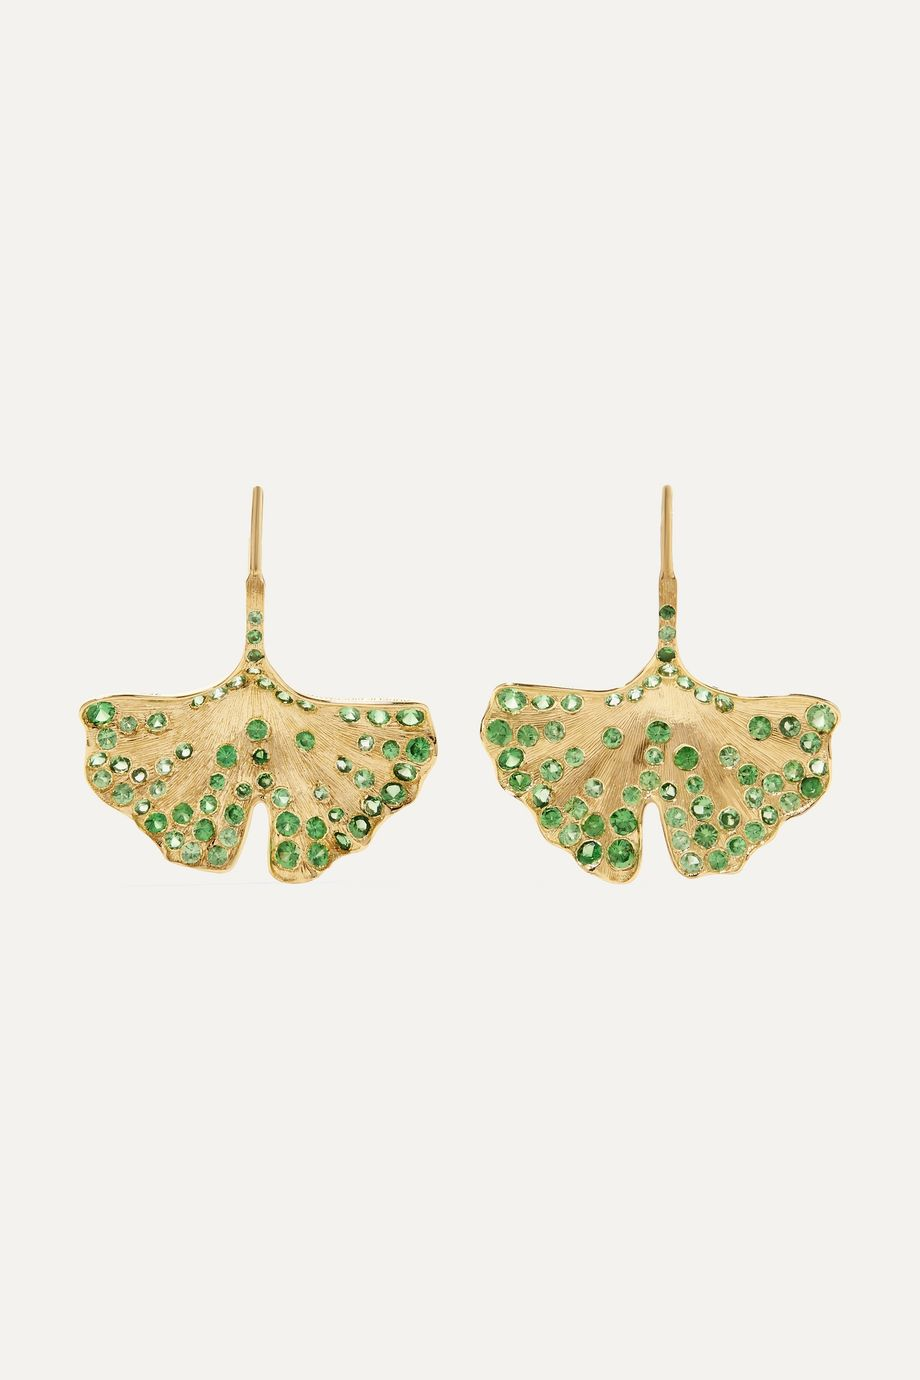 Aurélie Bidermann Ginkgo 18-karat gold tsavorite earrings